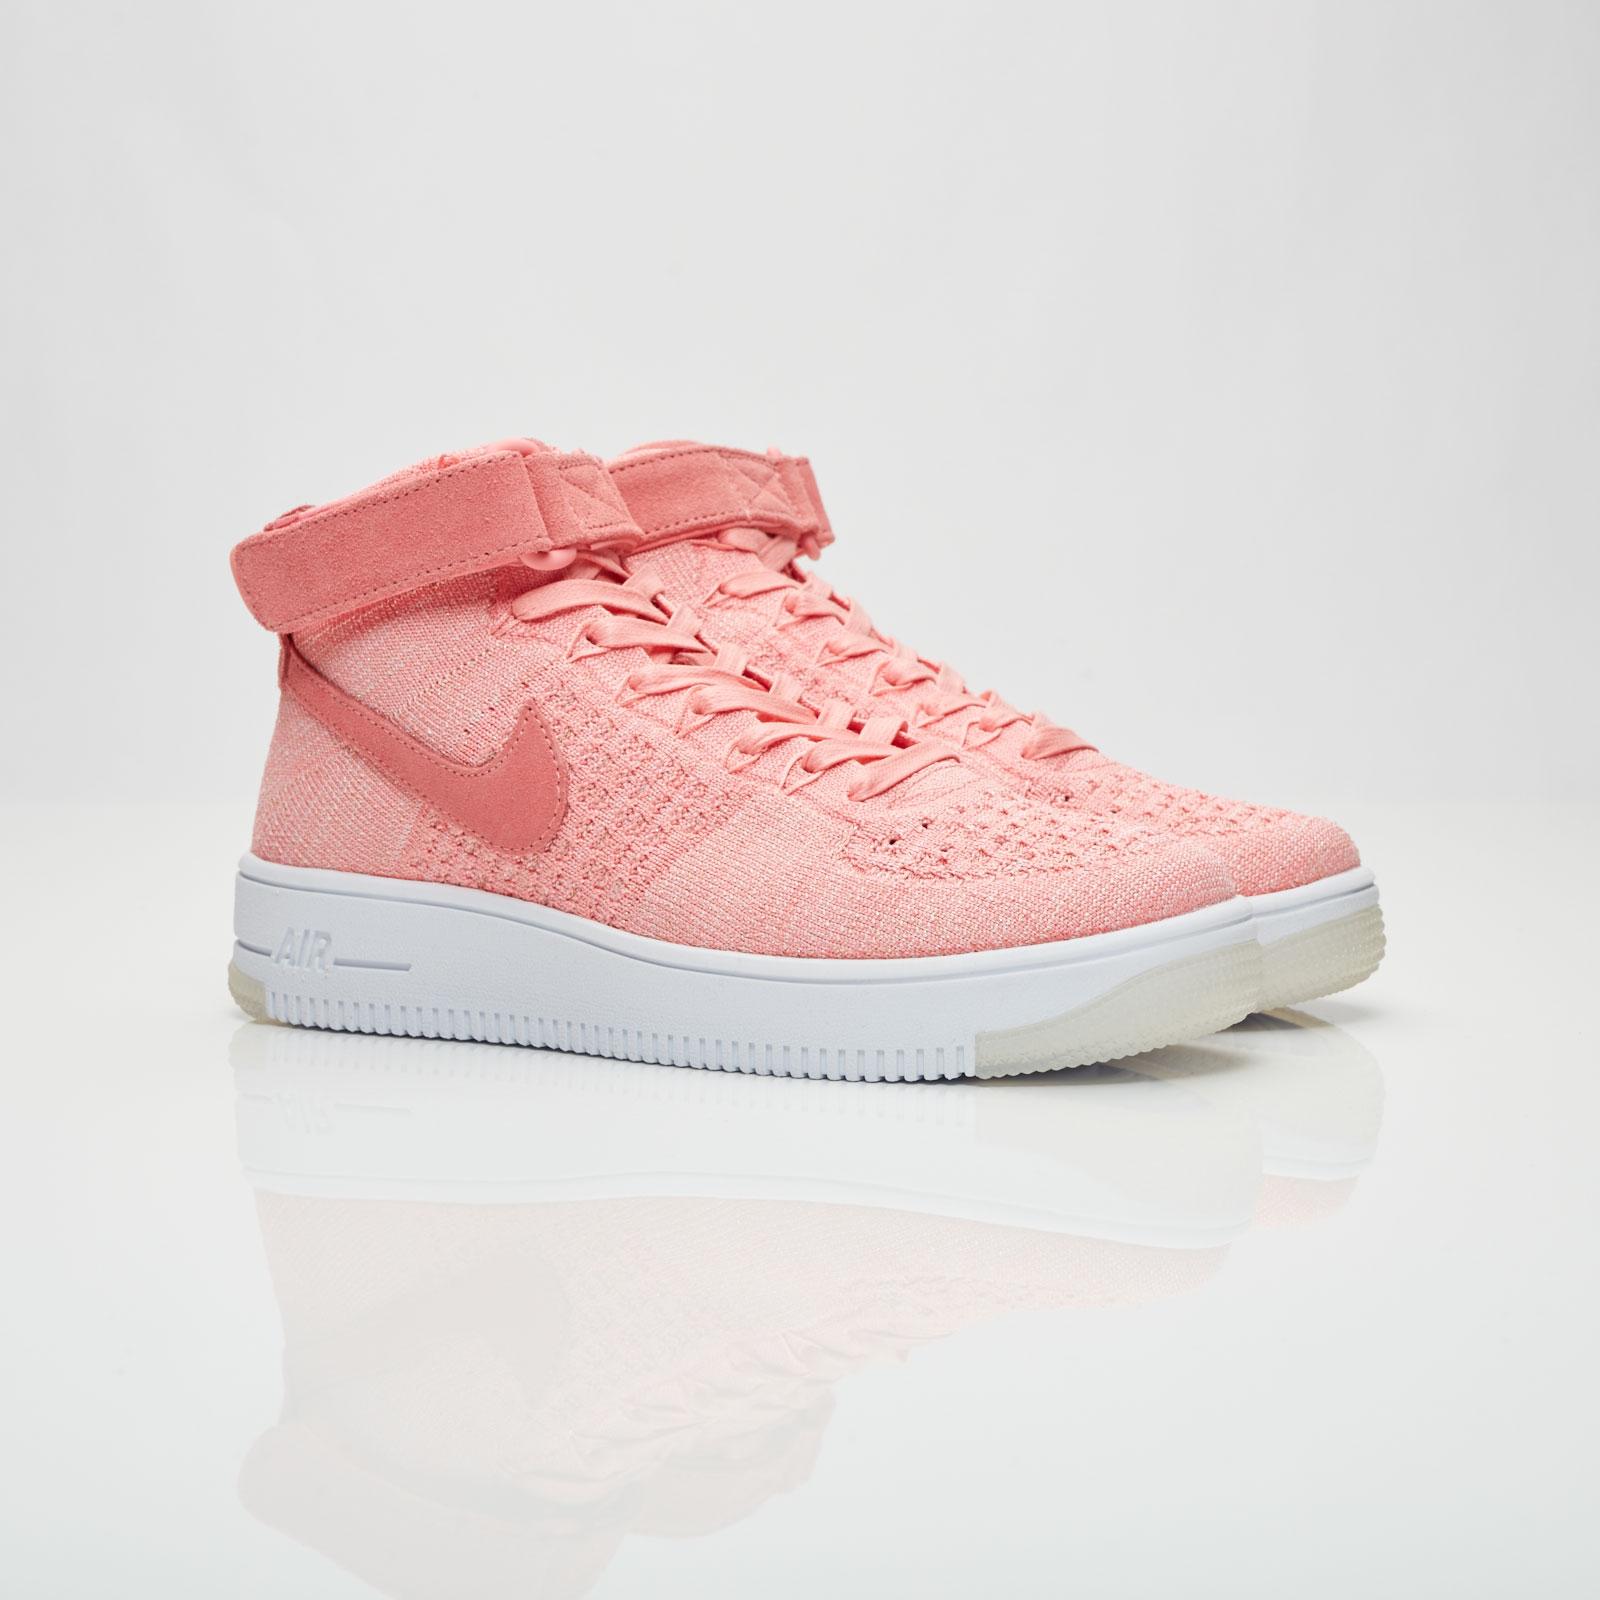 Nike Wmns Af1 Flyknit - 818018-802